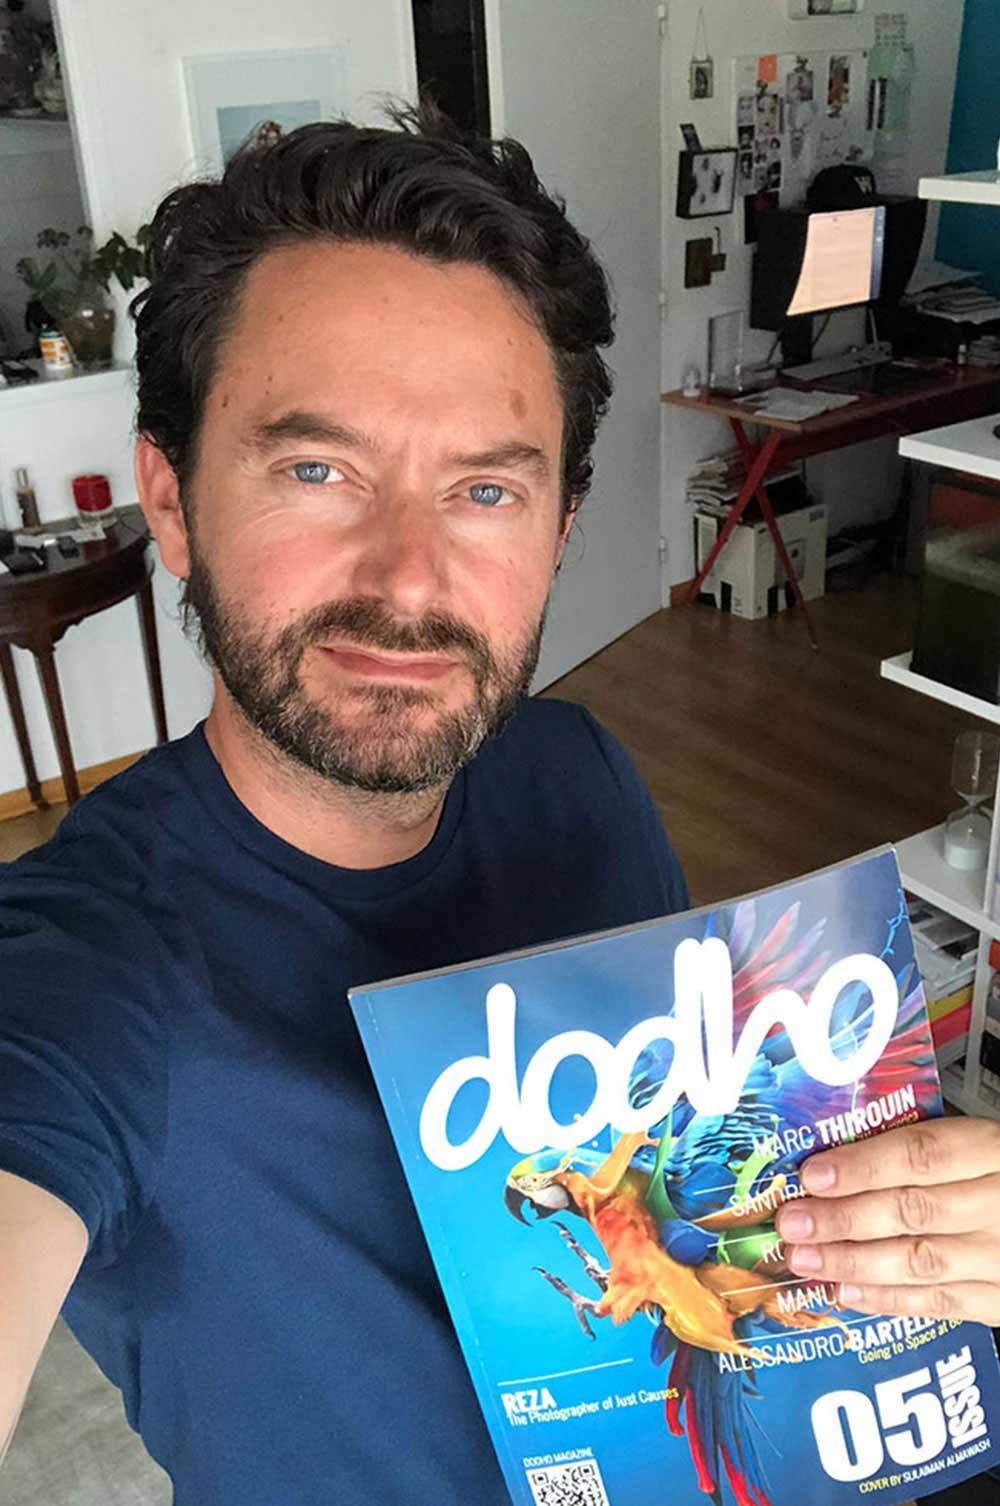 https://www.dodho.com/wp-content/uploads/2019/09/A5.jpg